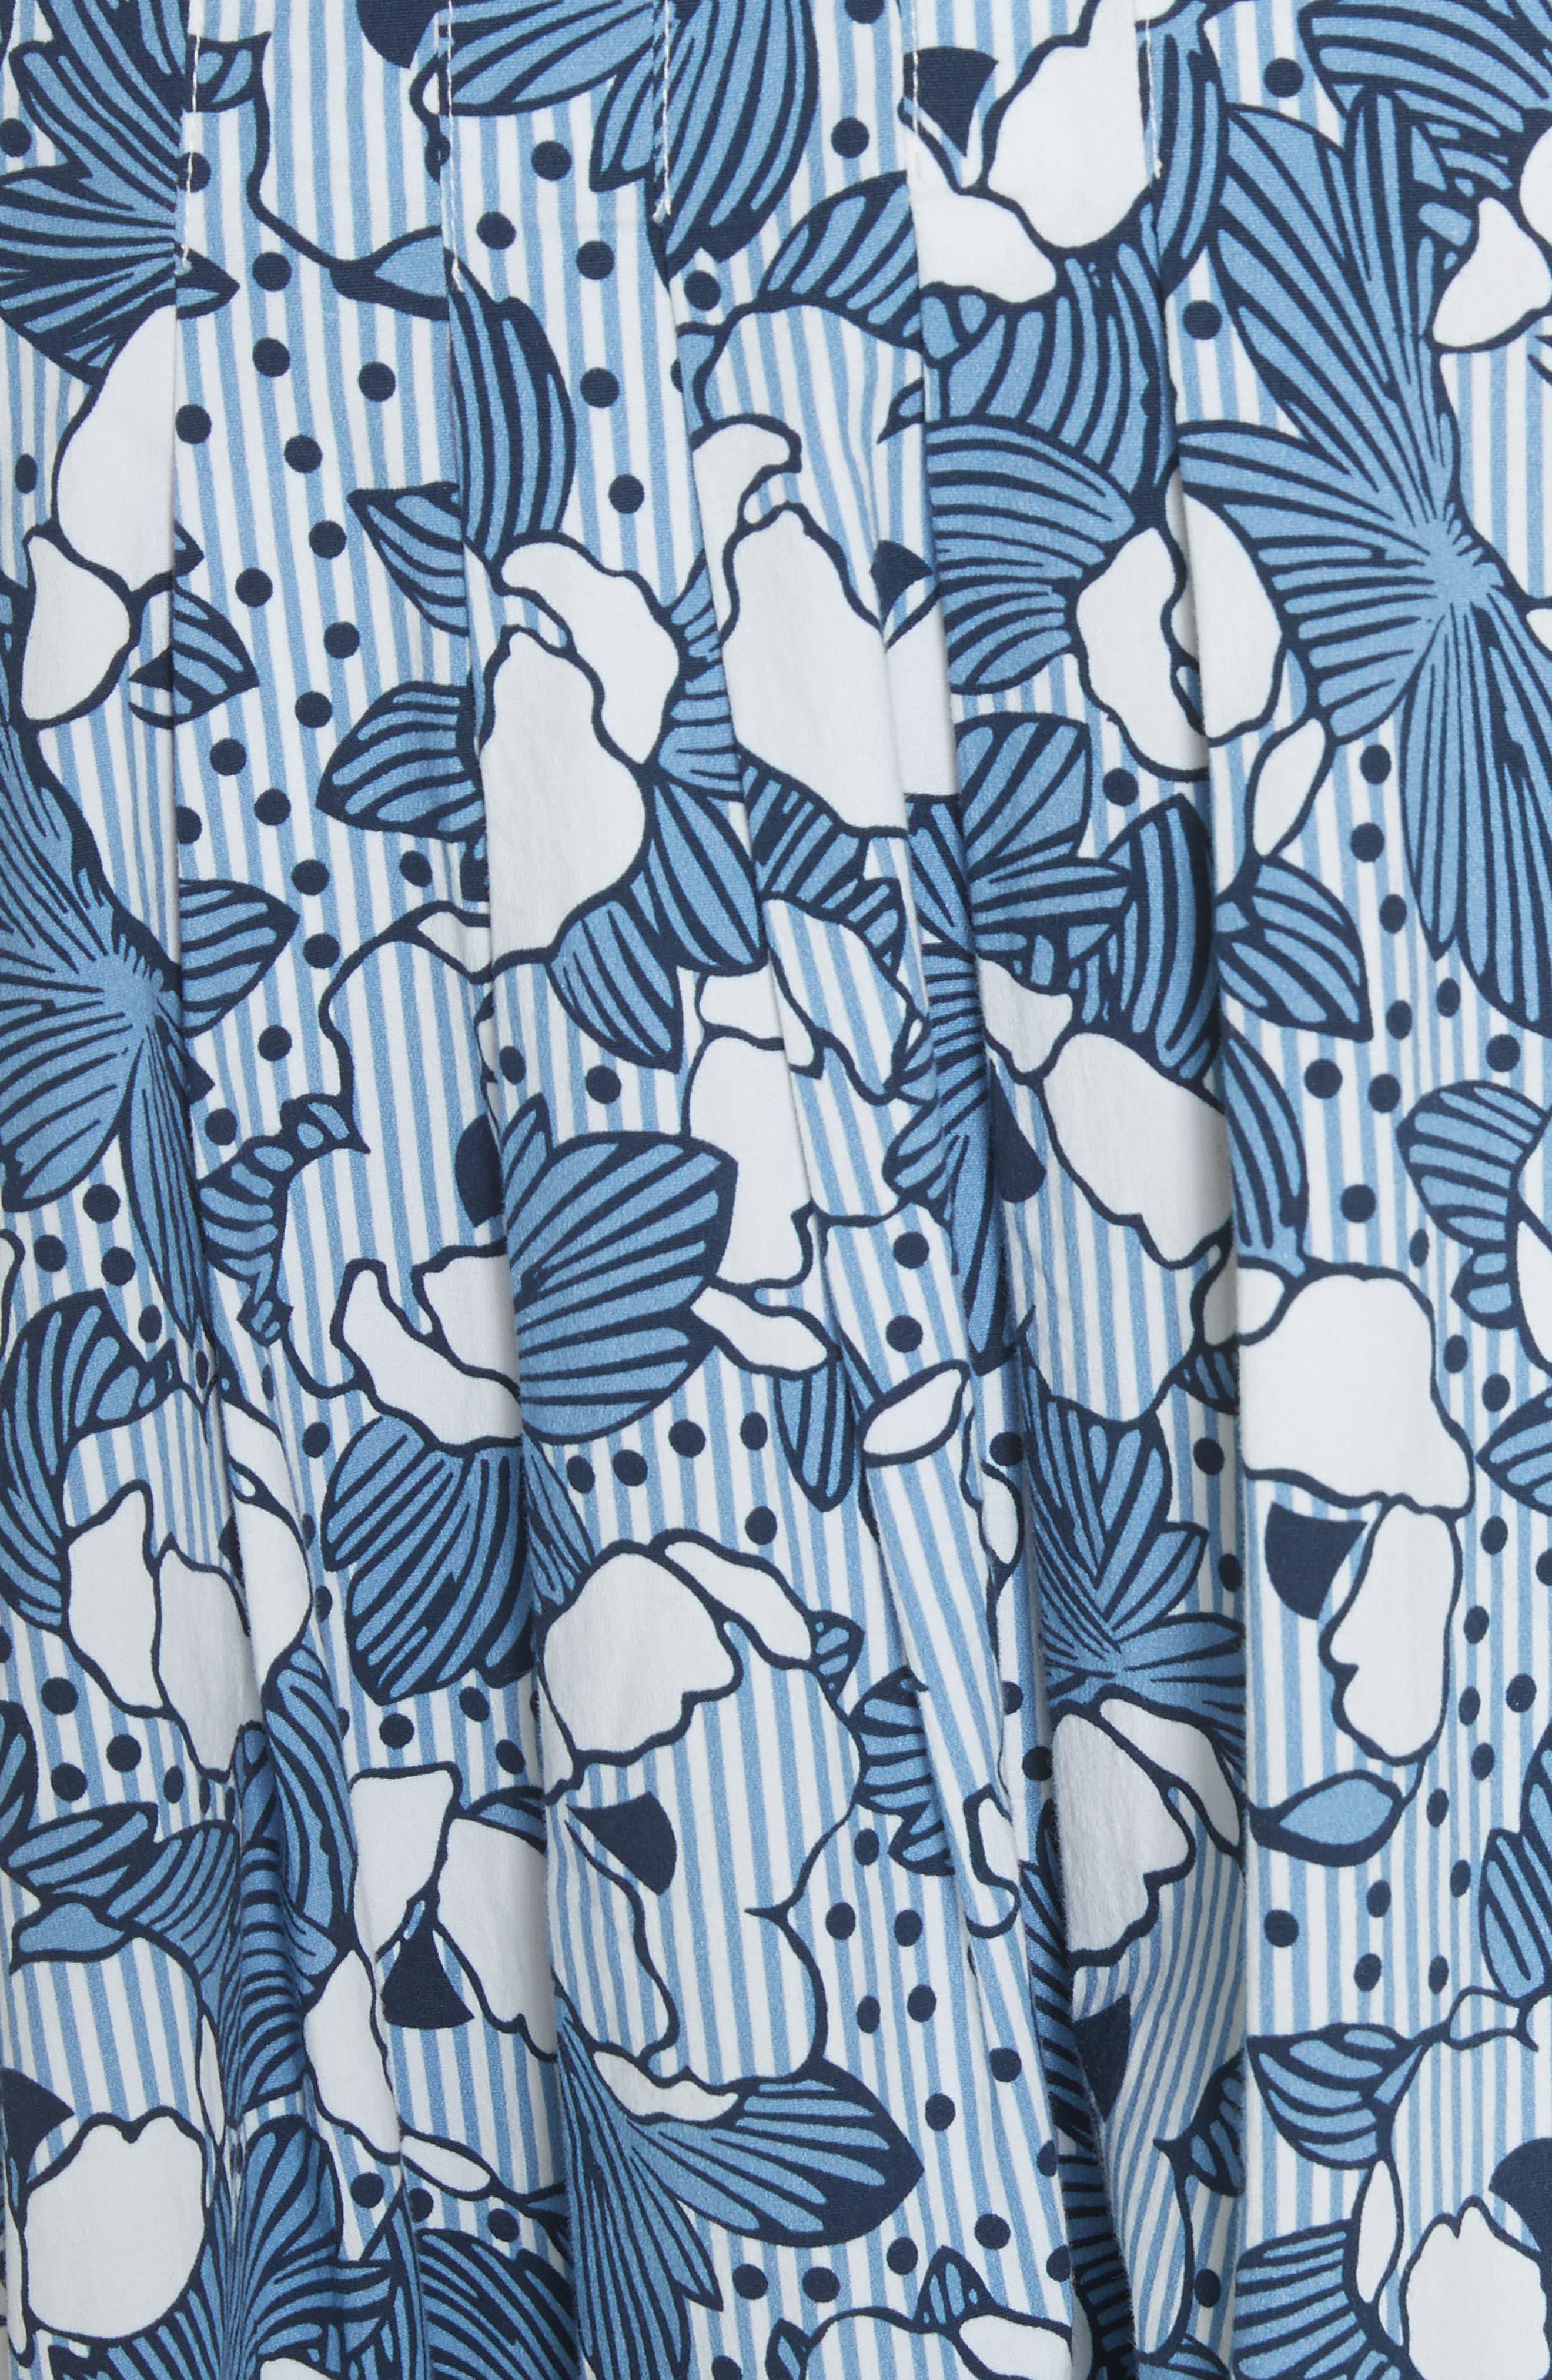 Caralina Floral Print Midi Skirt,                             Alternate thumbnail 5, color,                             Blue/ White